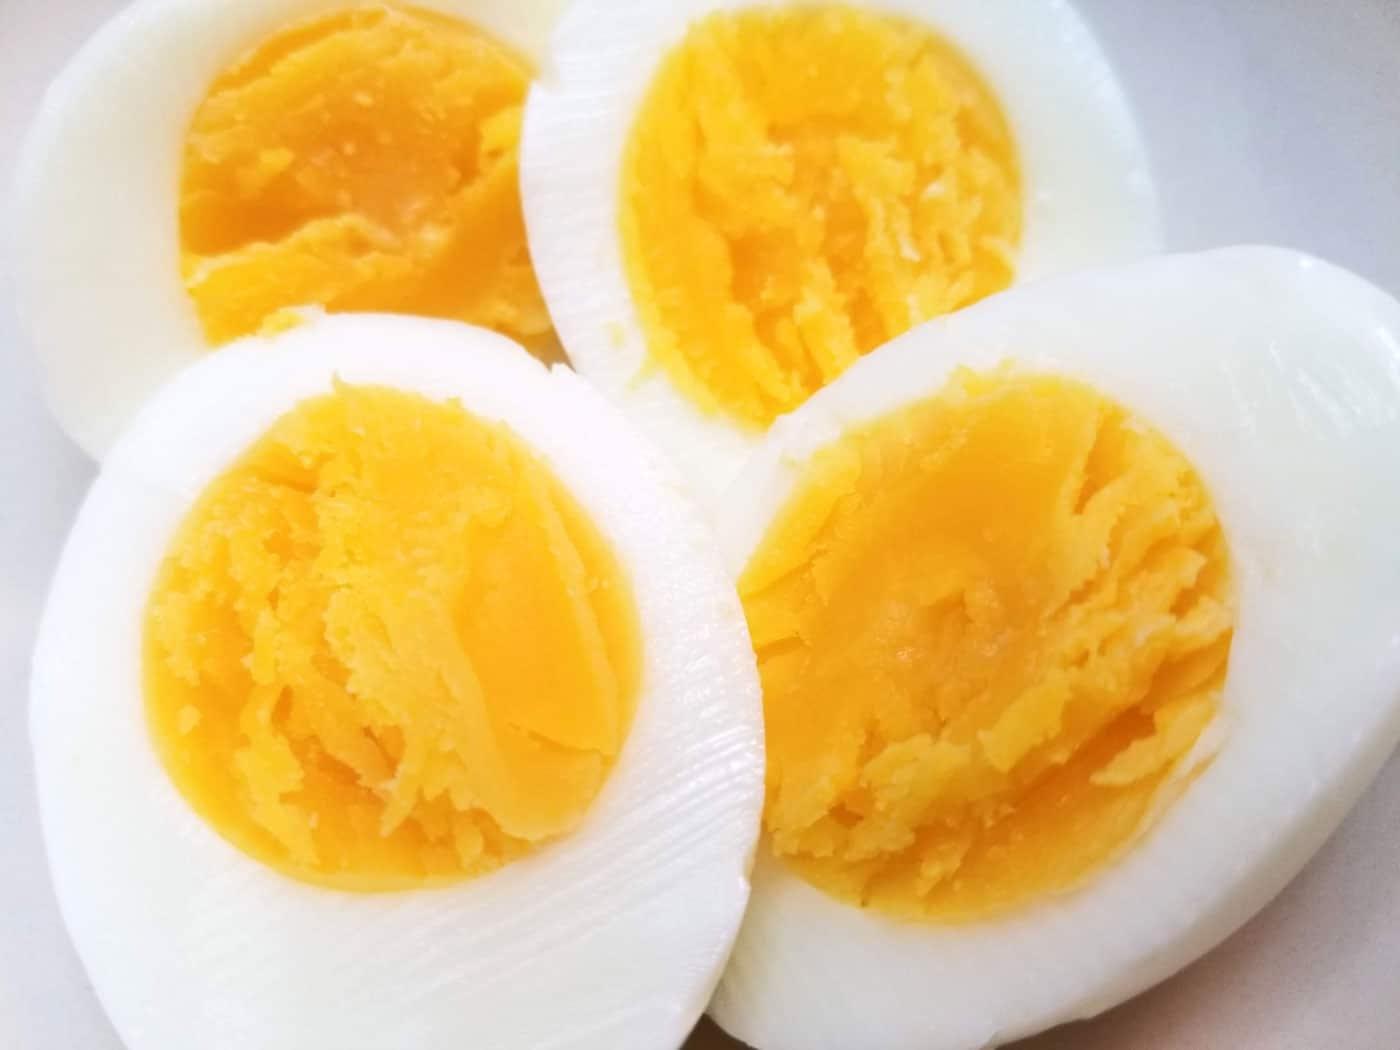 boiled eggs instant pot